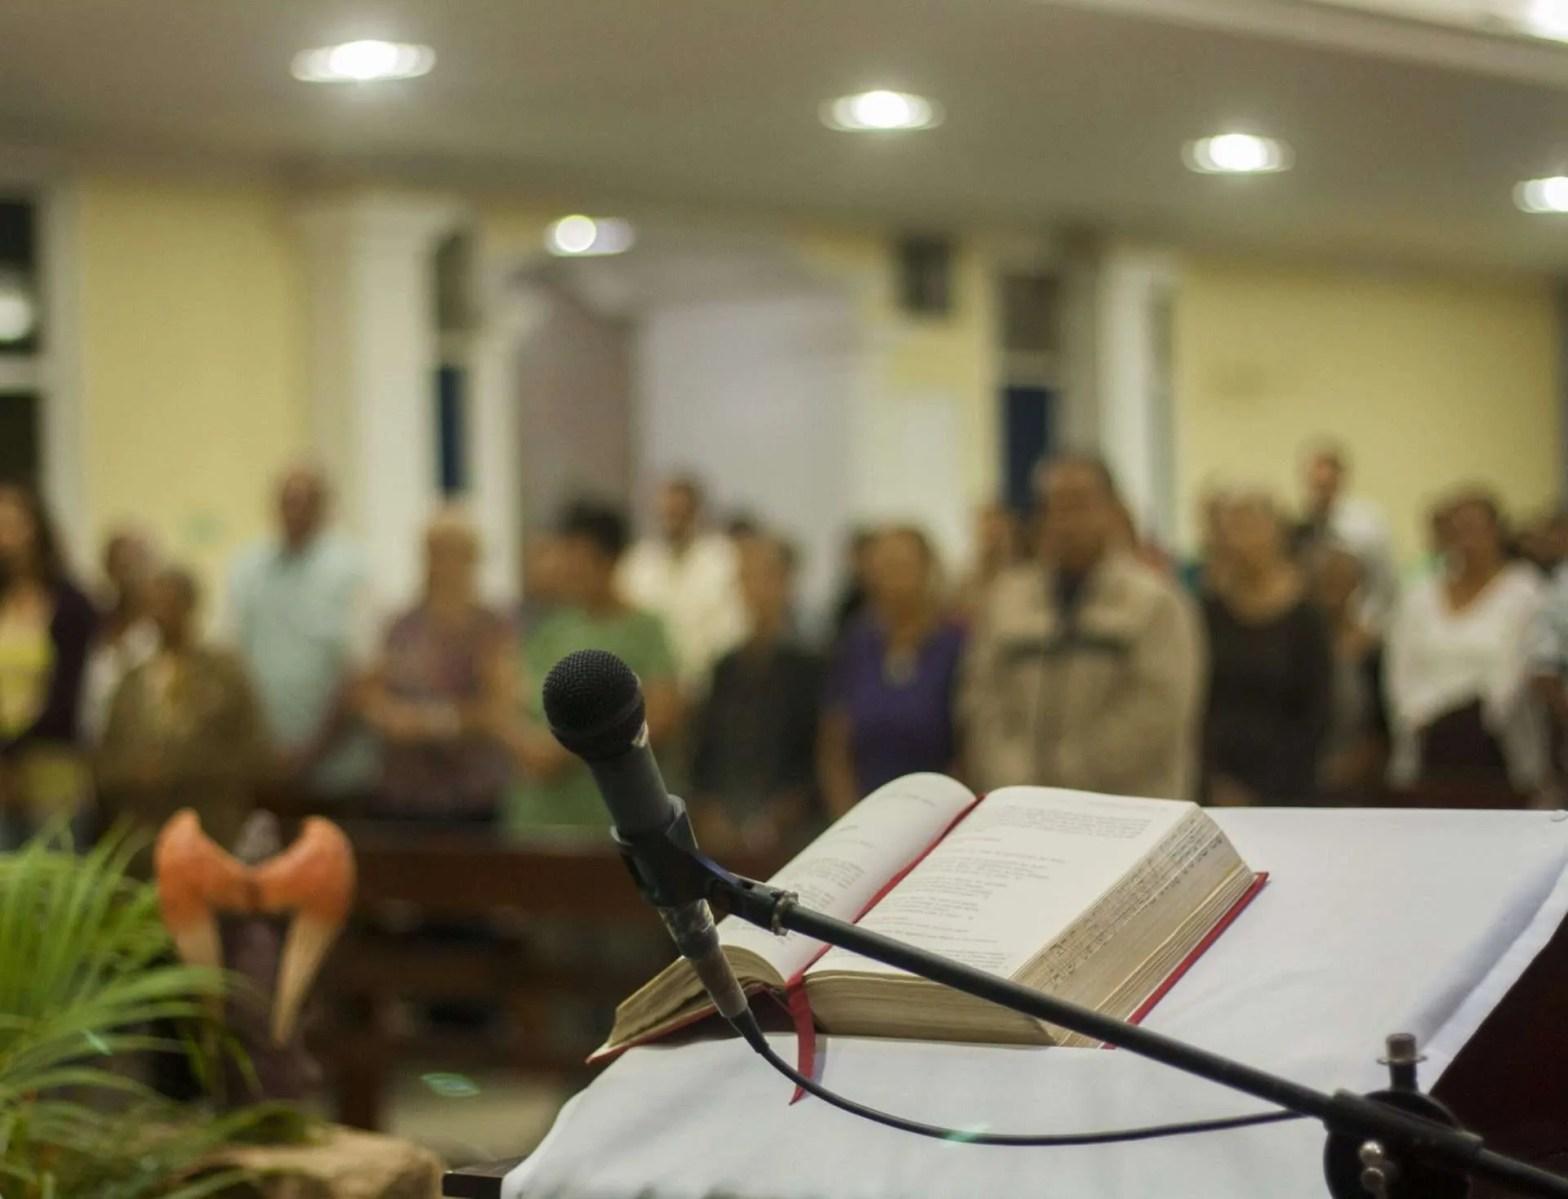 Can a Woman preach at Mass?